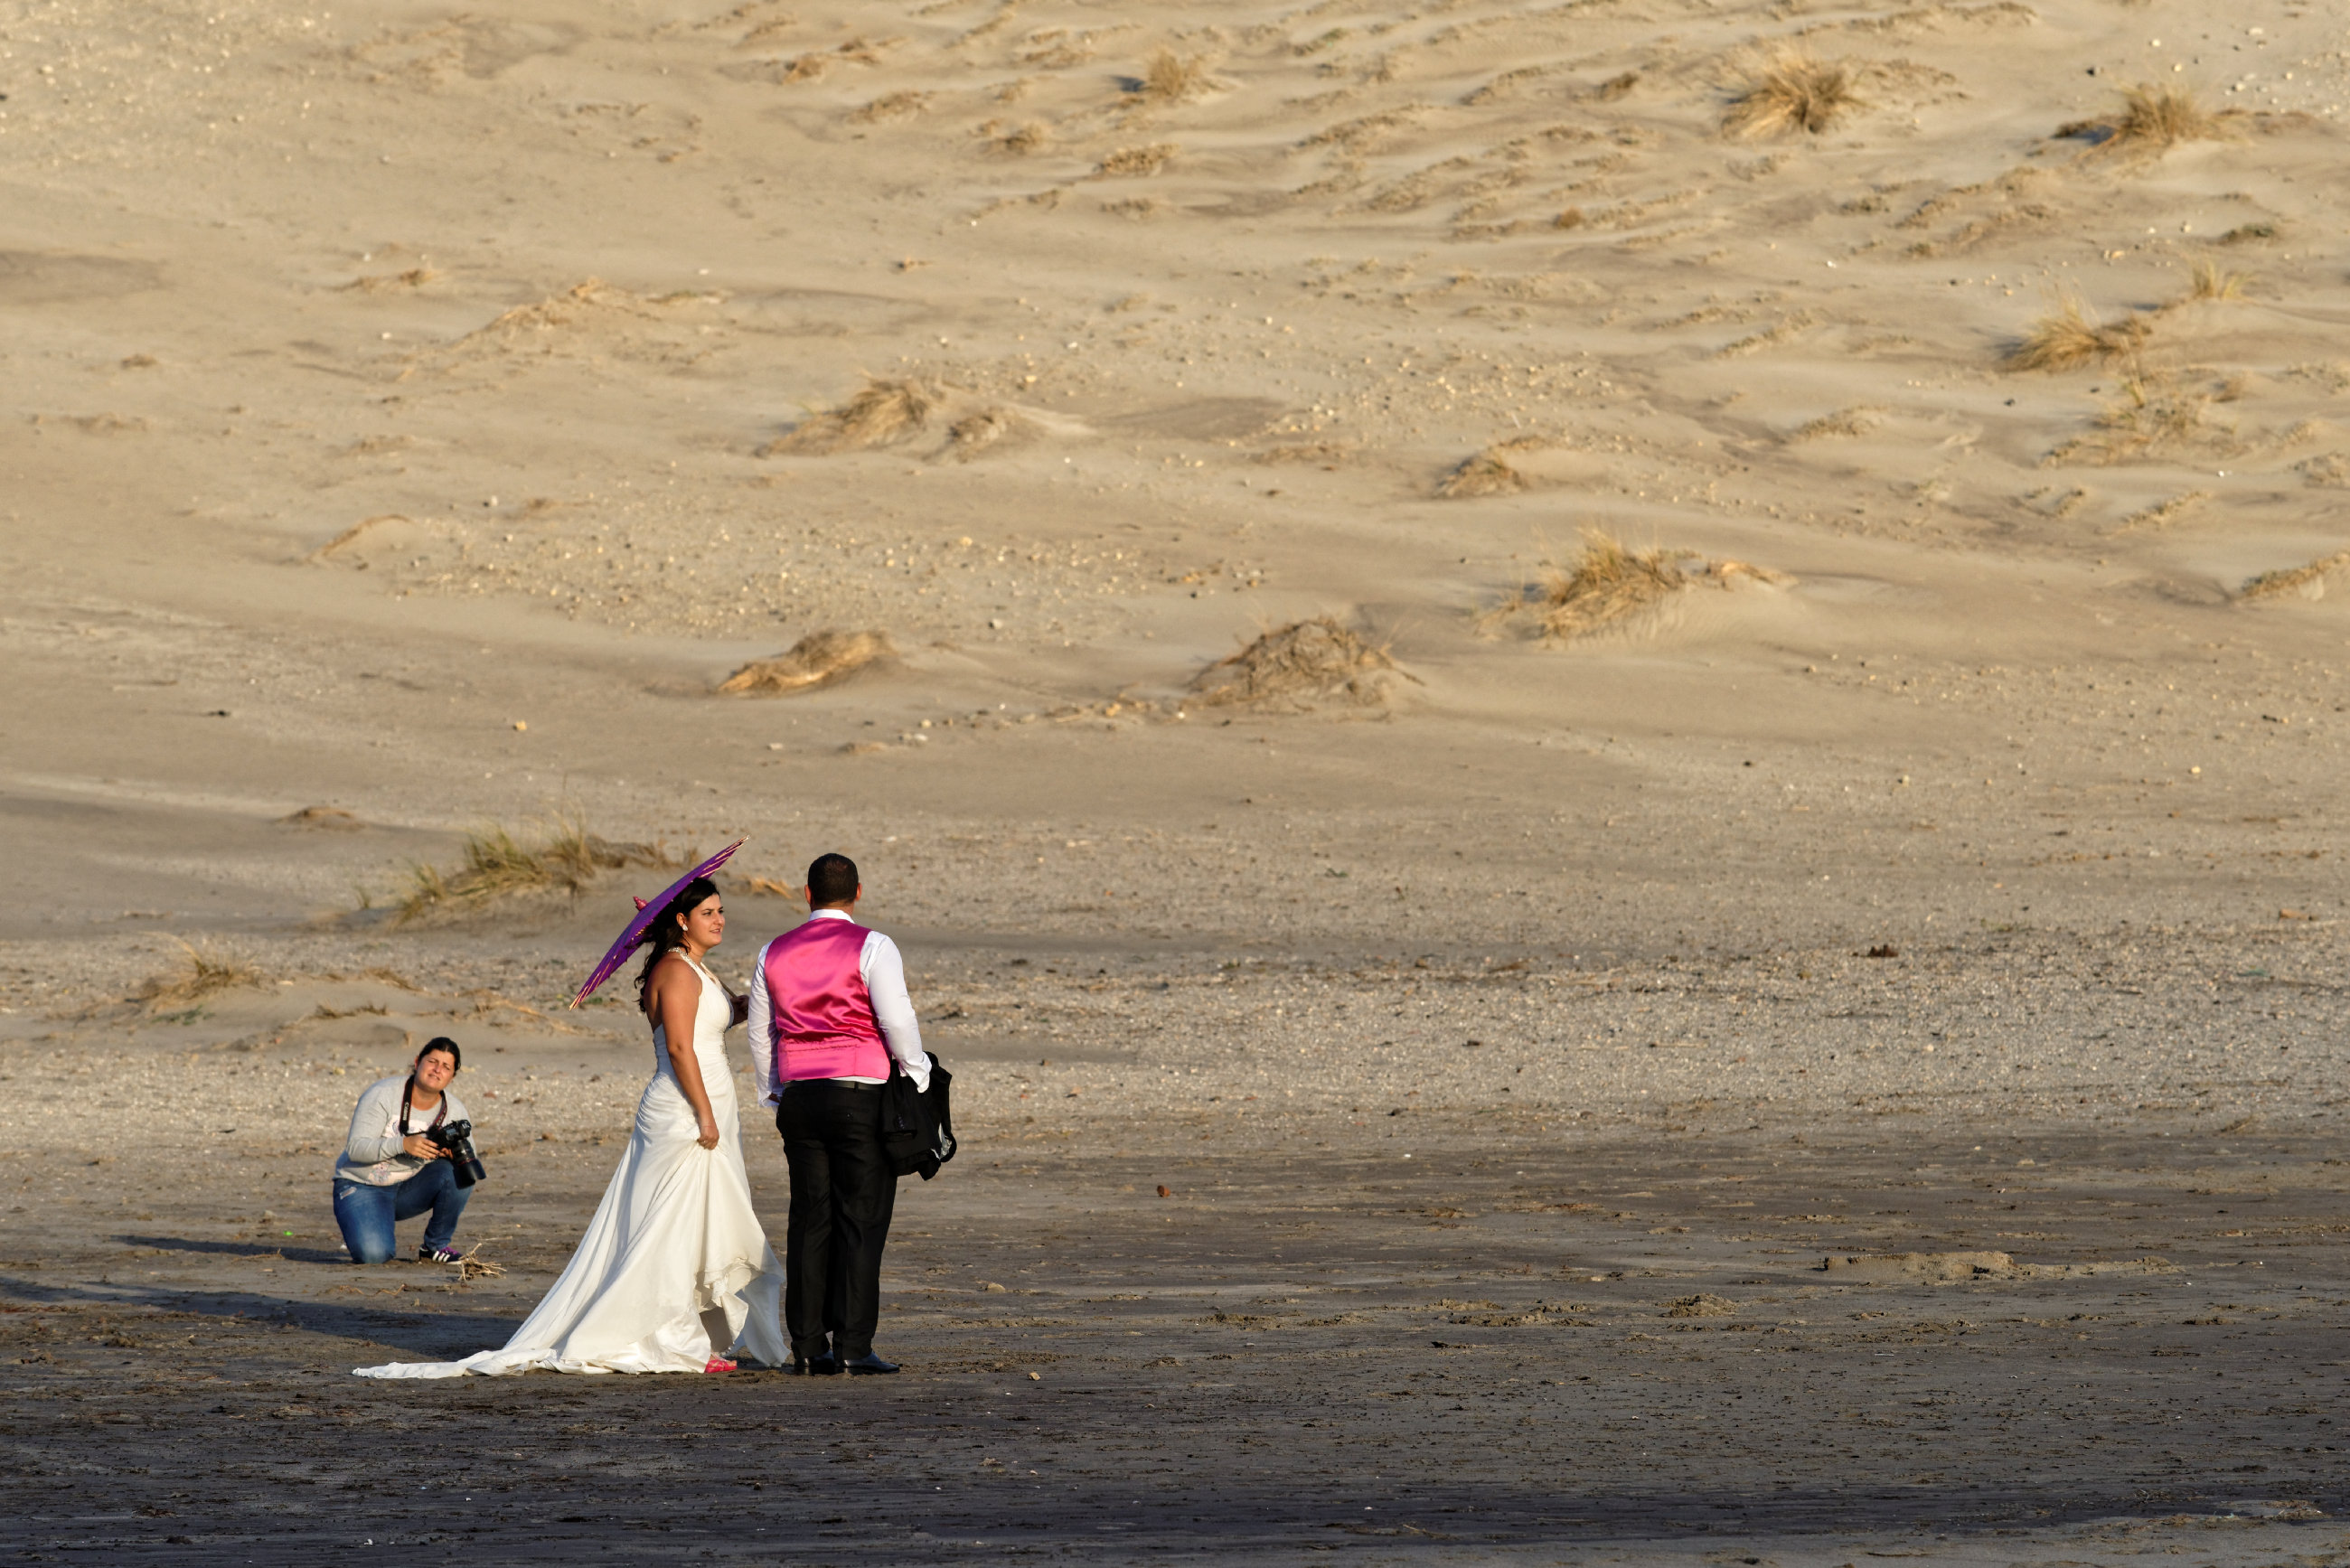 151104-San Jose-Playa de Monsul (32)